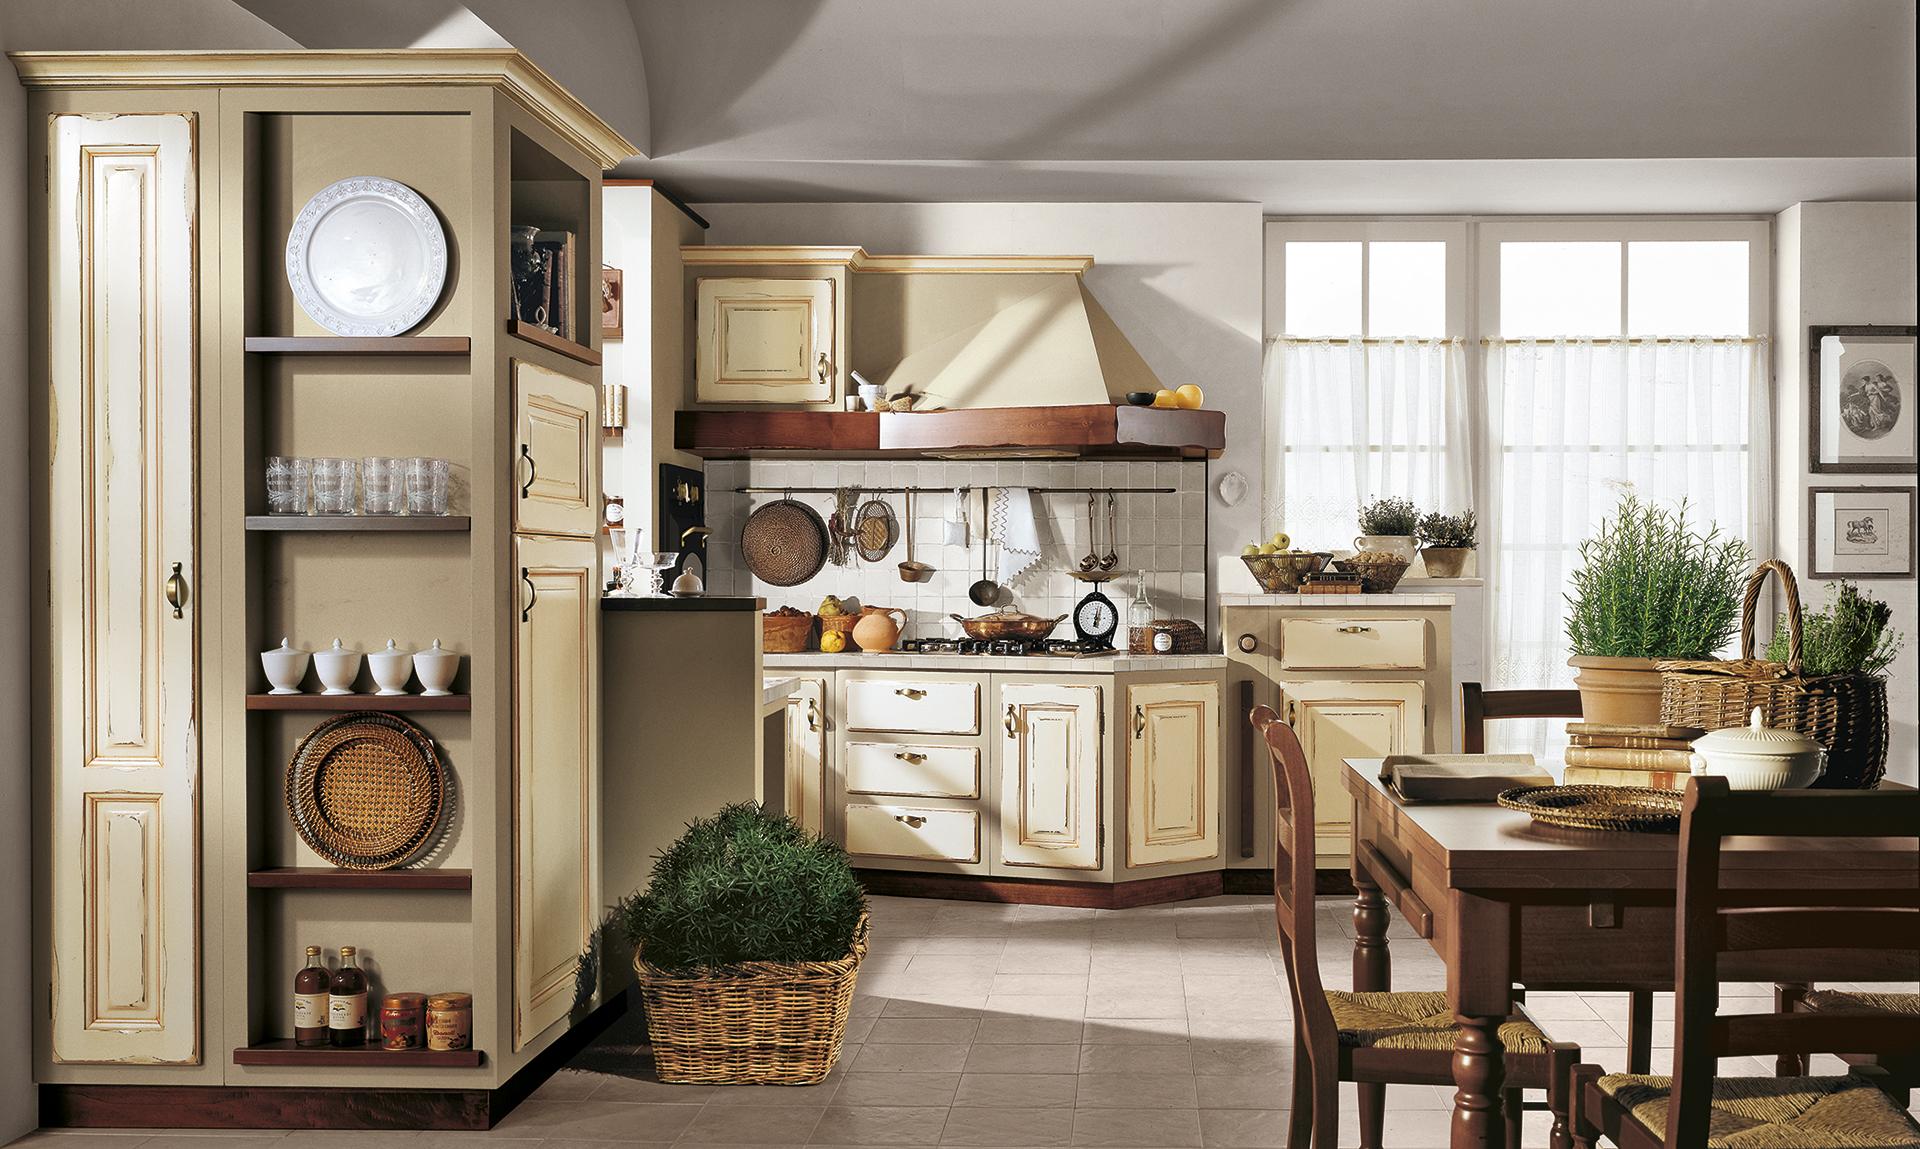 Onelia - Borgo Antico Kitchens - The LUBE Group